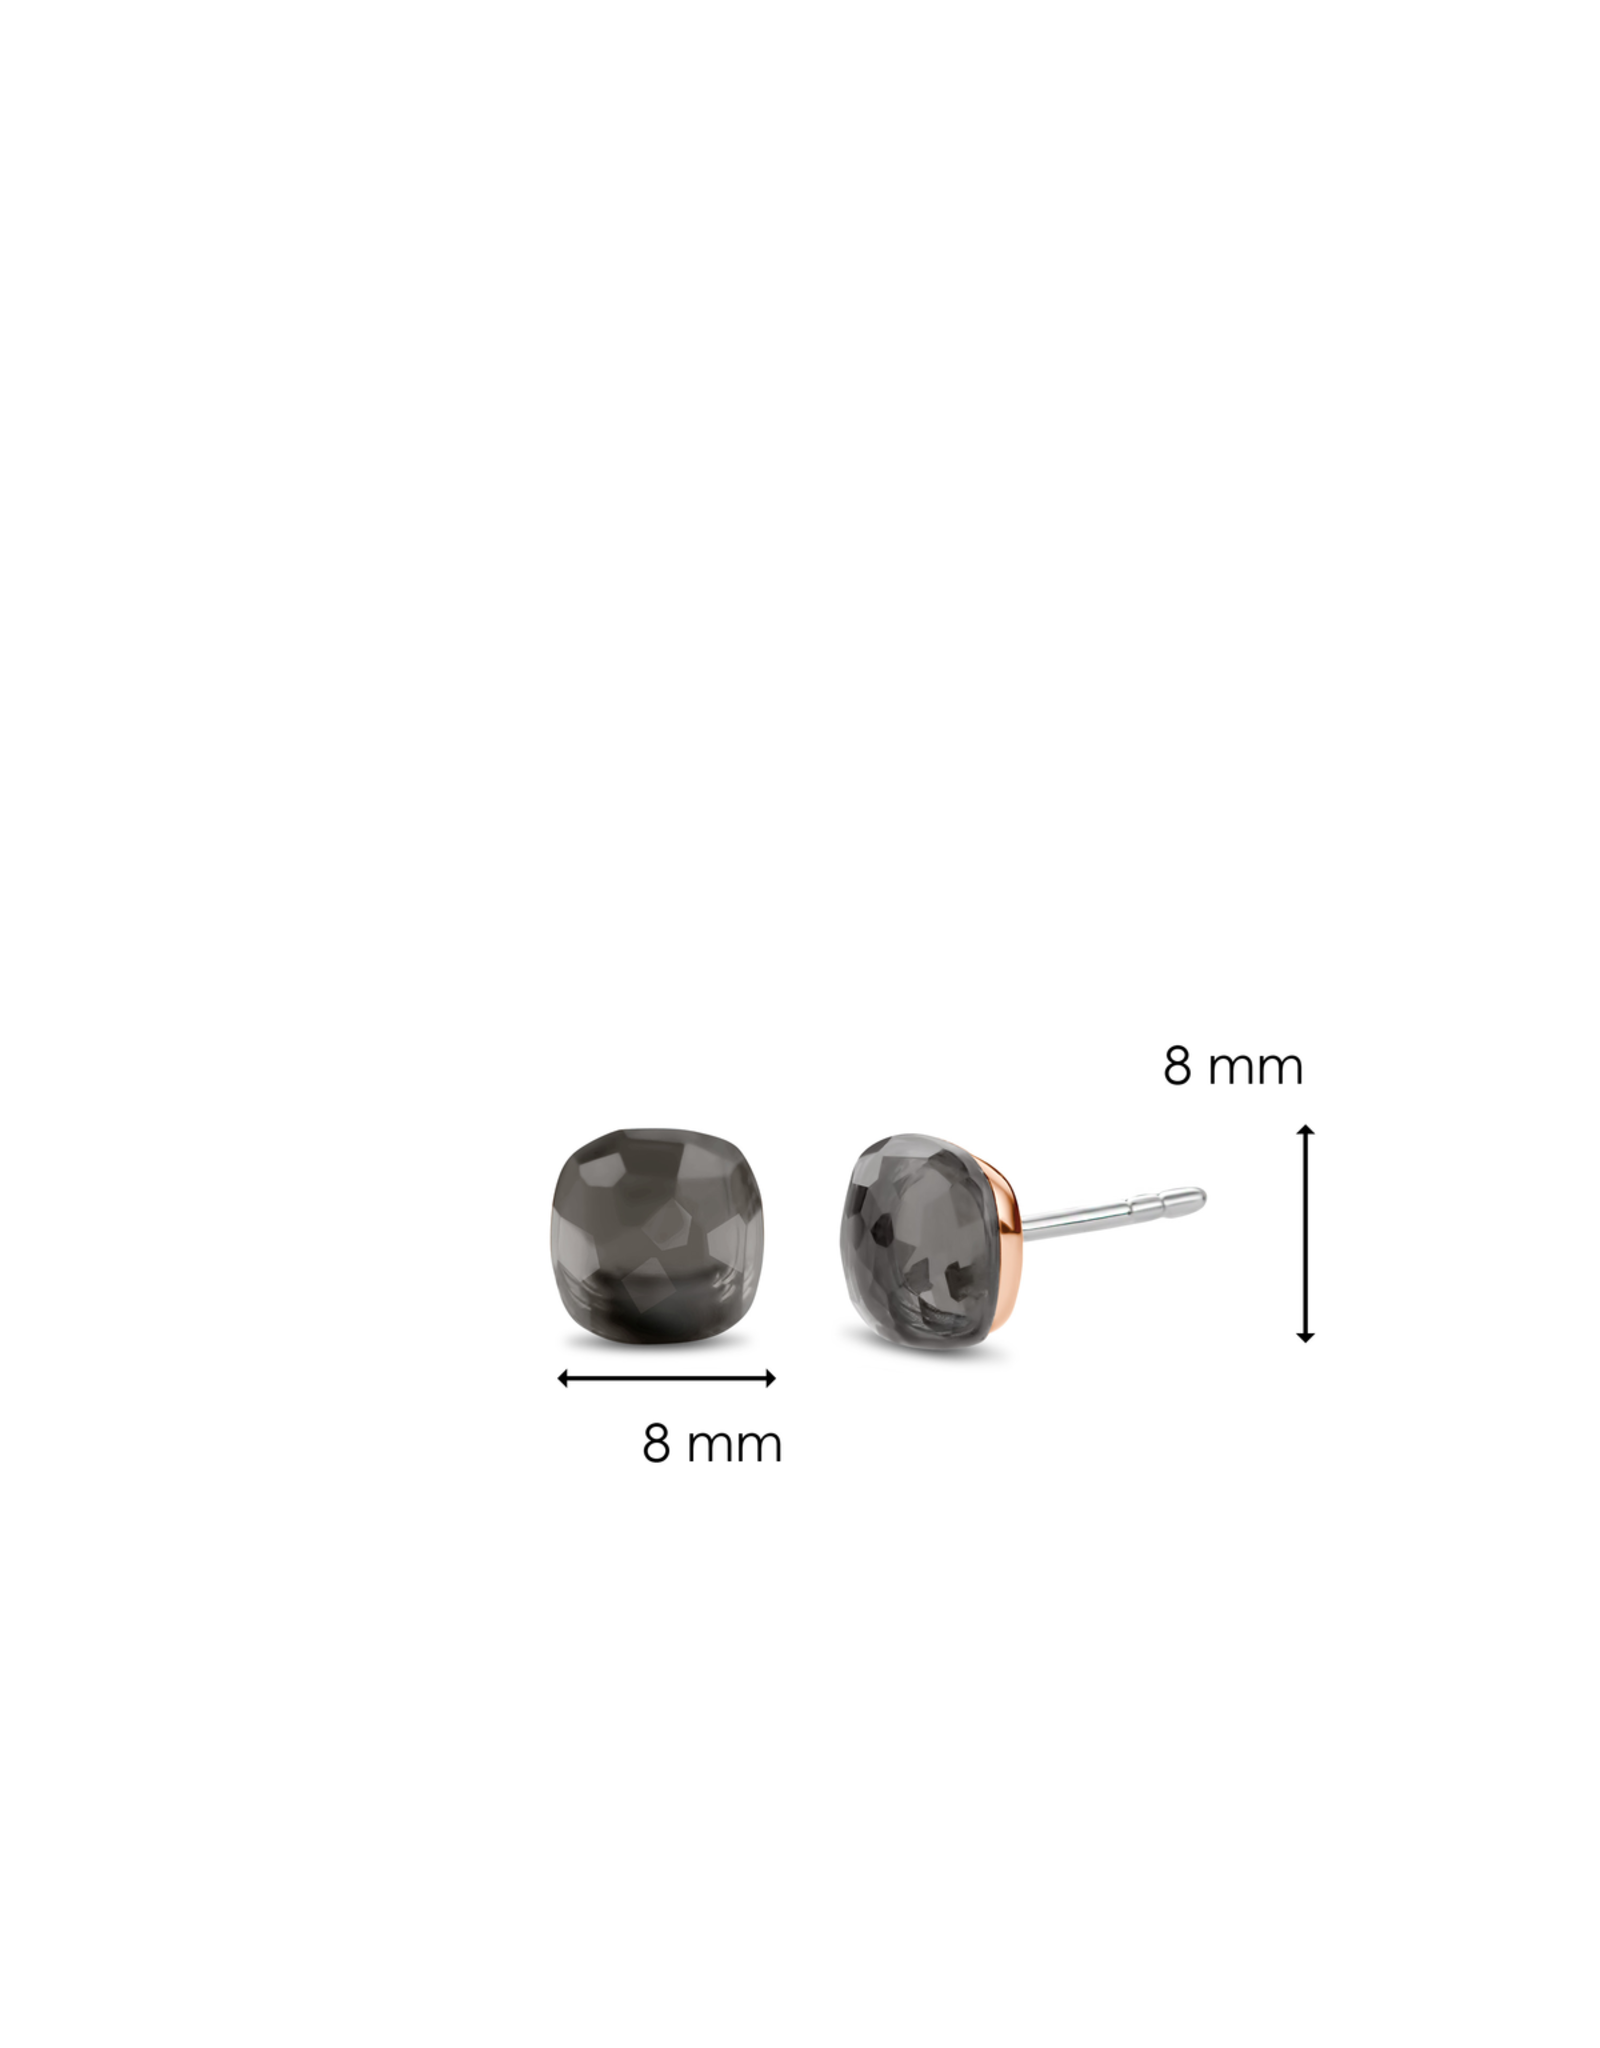 Translucent Grey Stud Earrings (8mm)- 7814GB